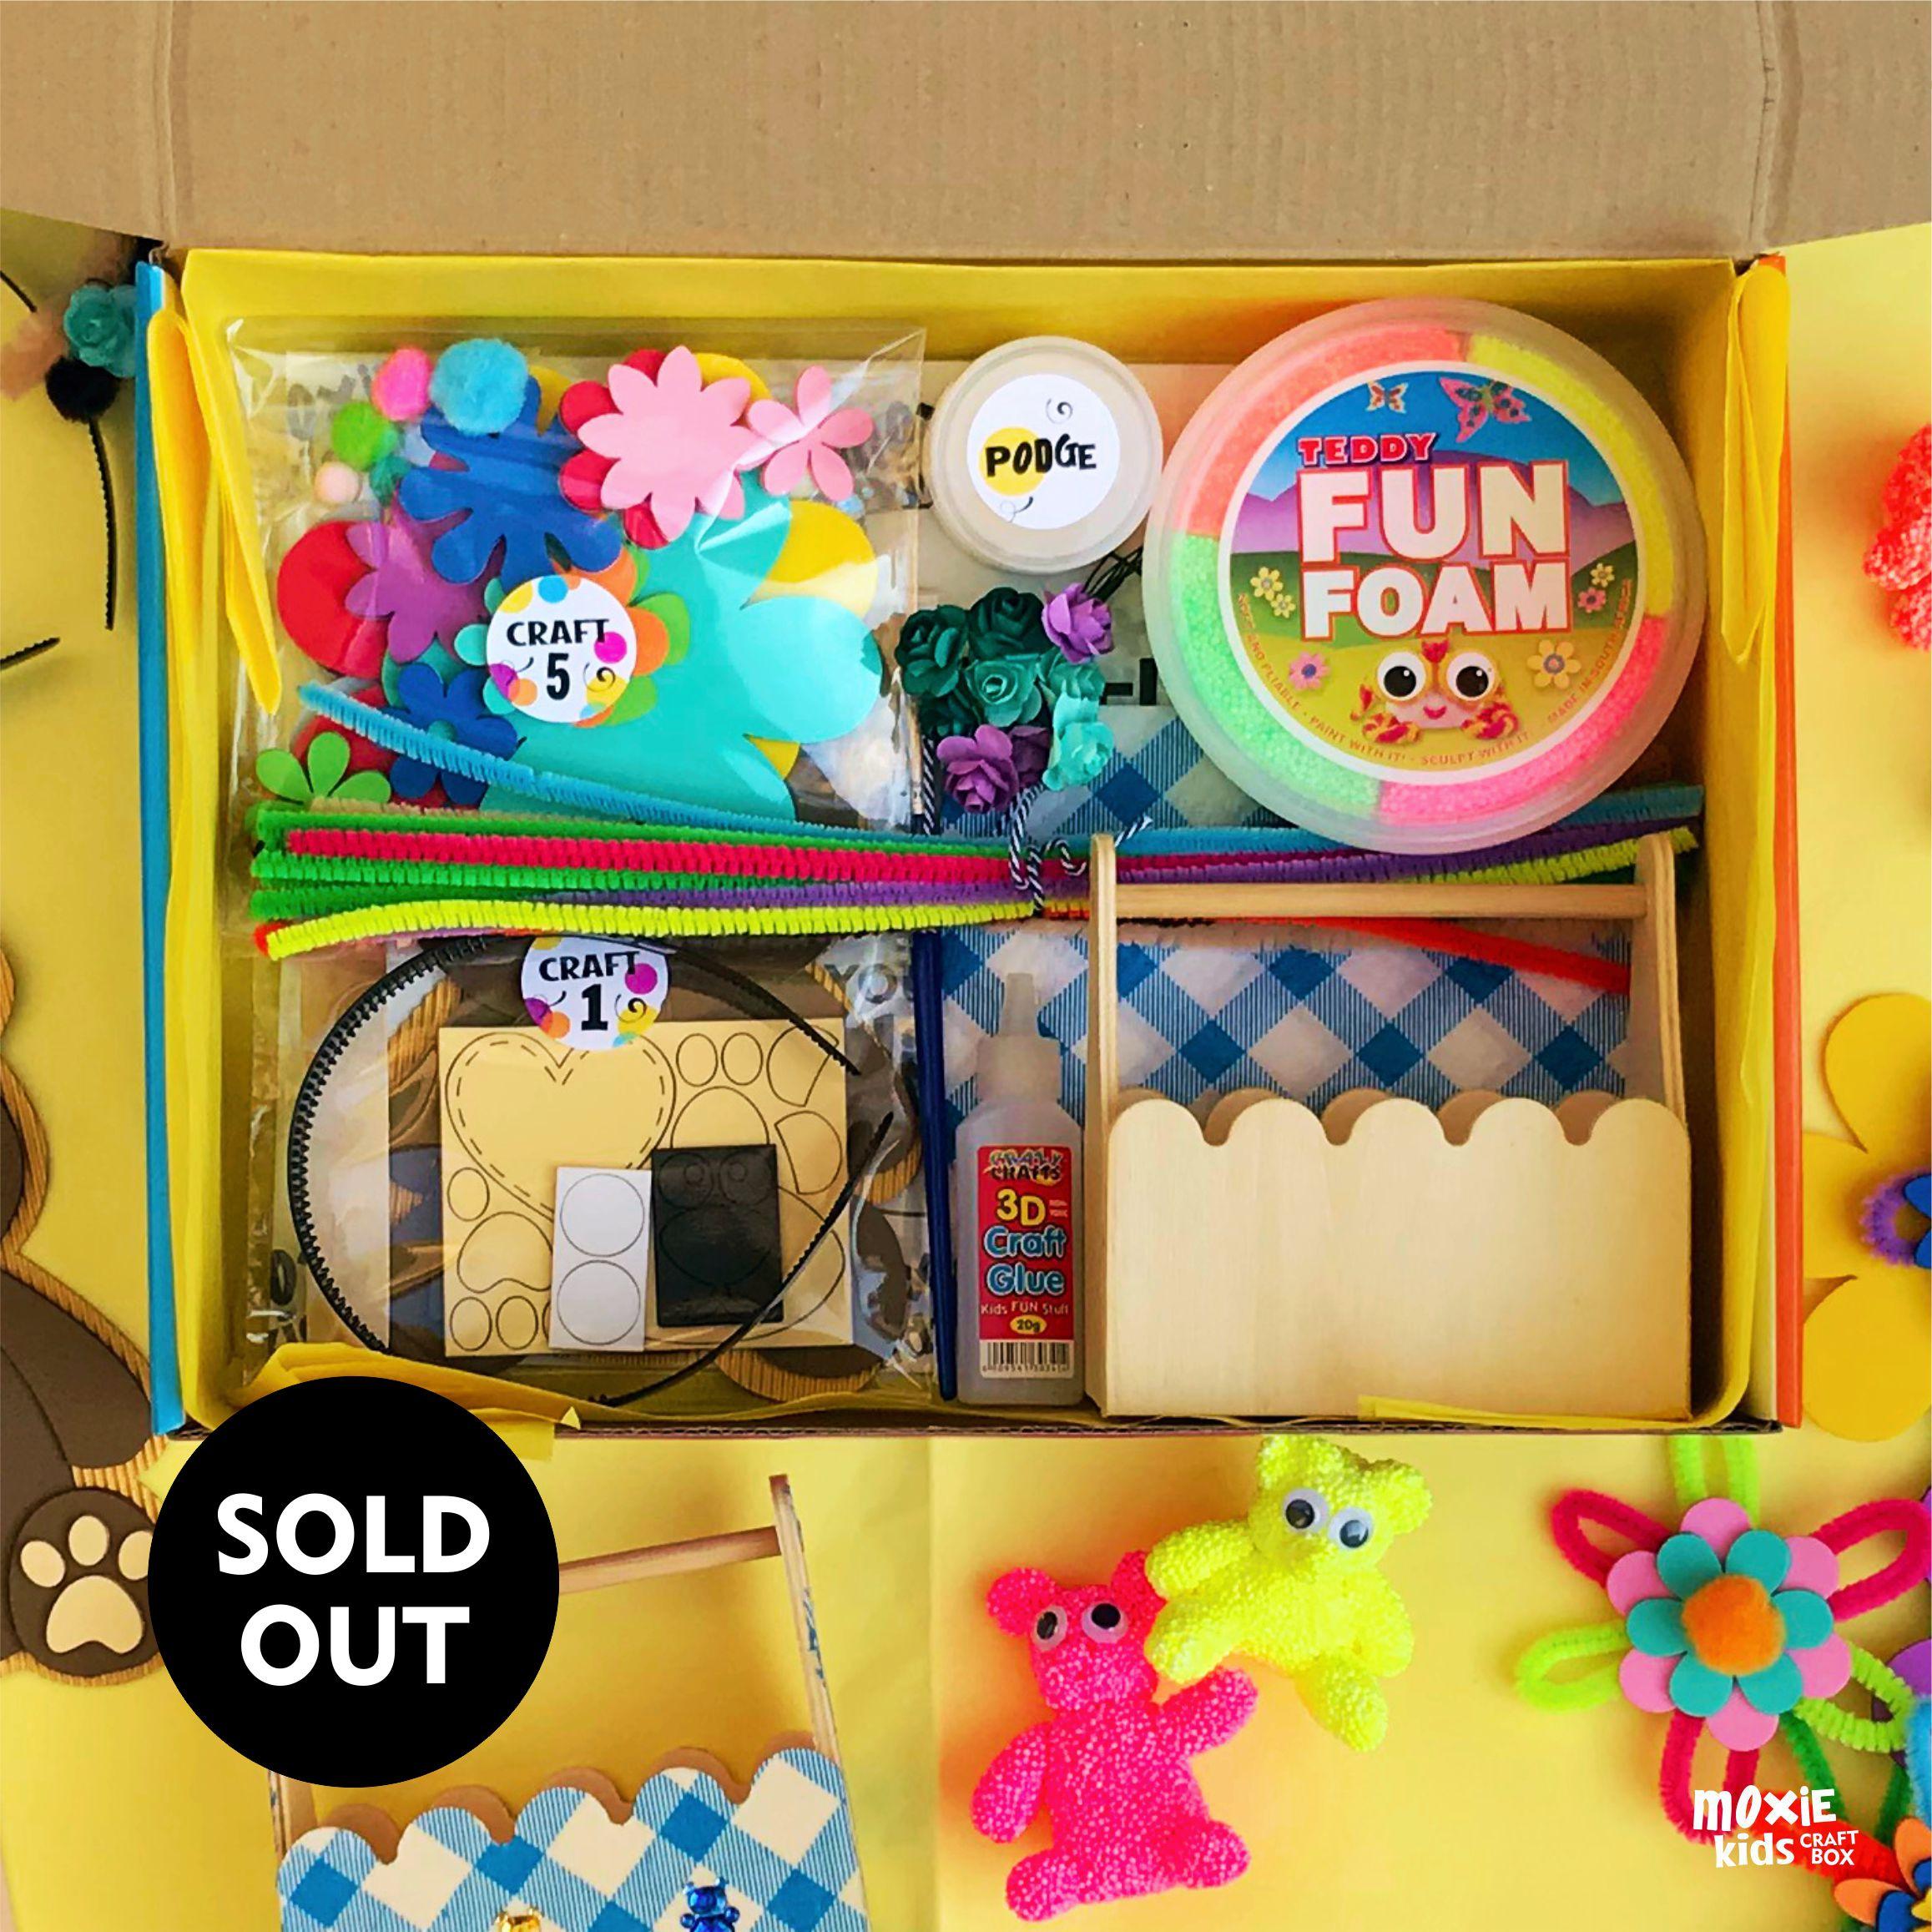 https://www.moxiekids.co.za/wp-content/uploads/2021/08/Moxie-Kids-Teddy-Bears-Picnic-Sold-Out.jpg